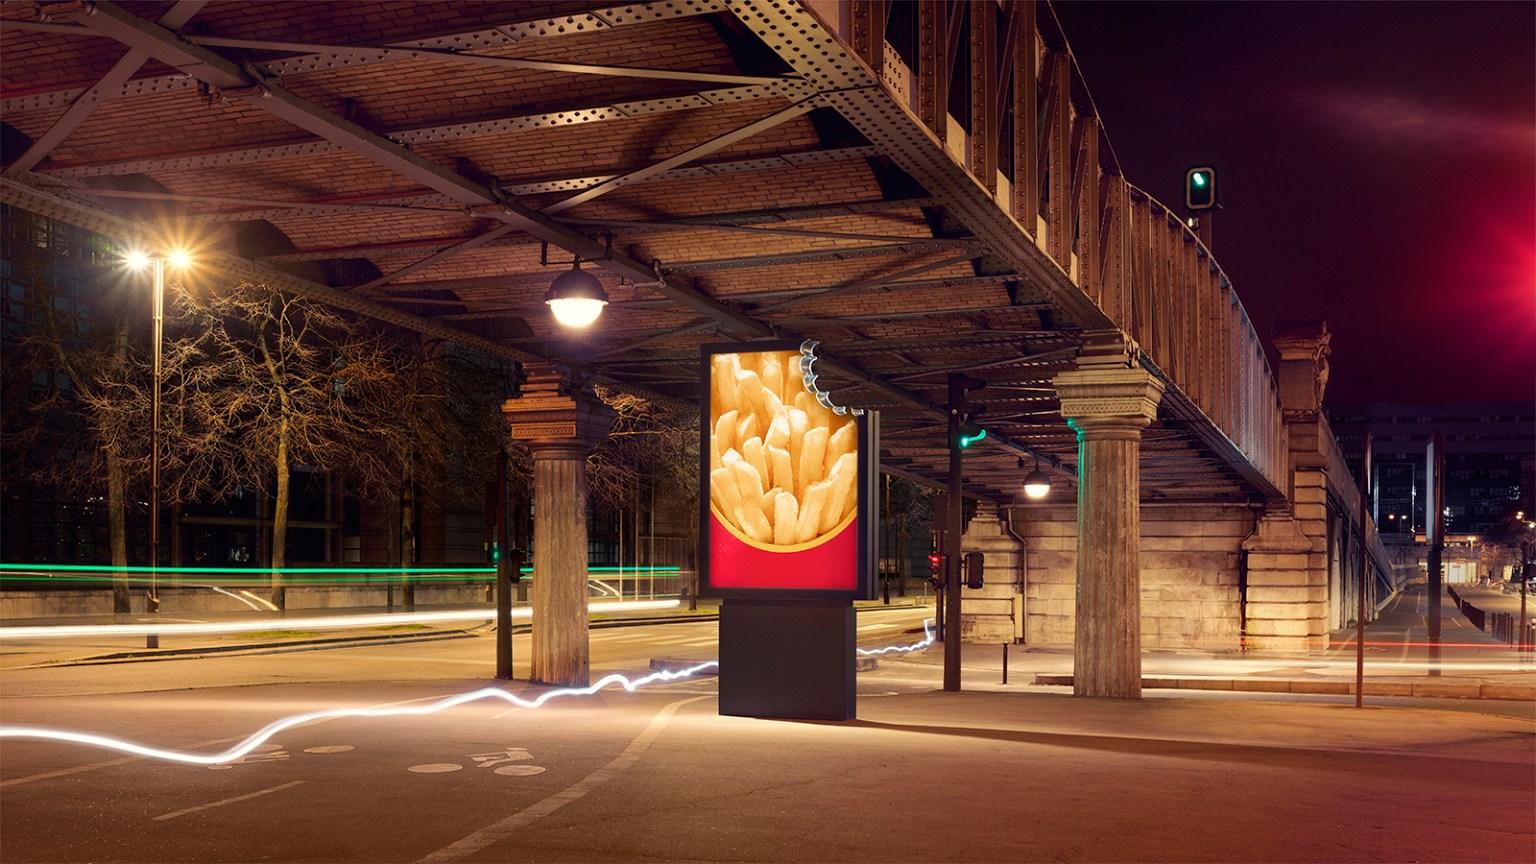 Affiche McDonald's : Grande frites